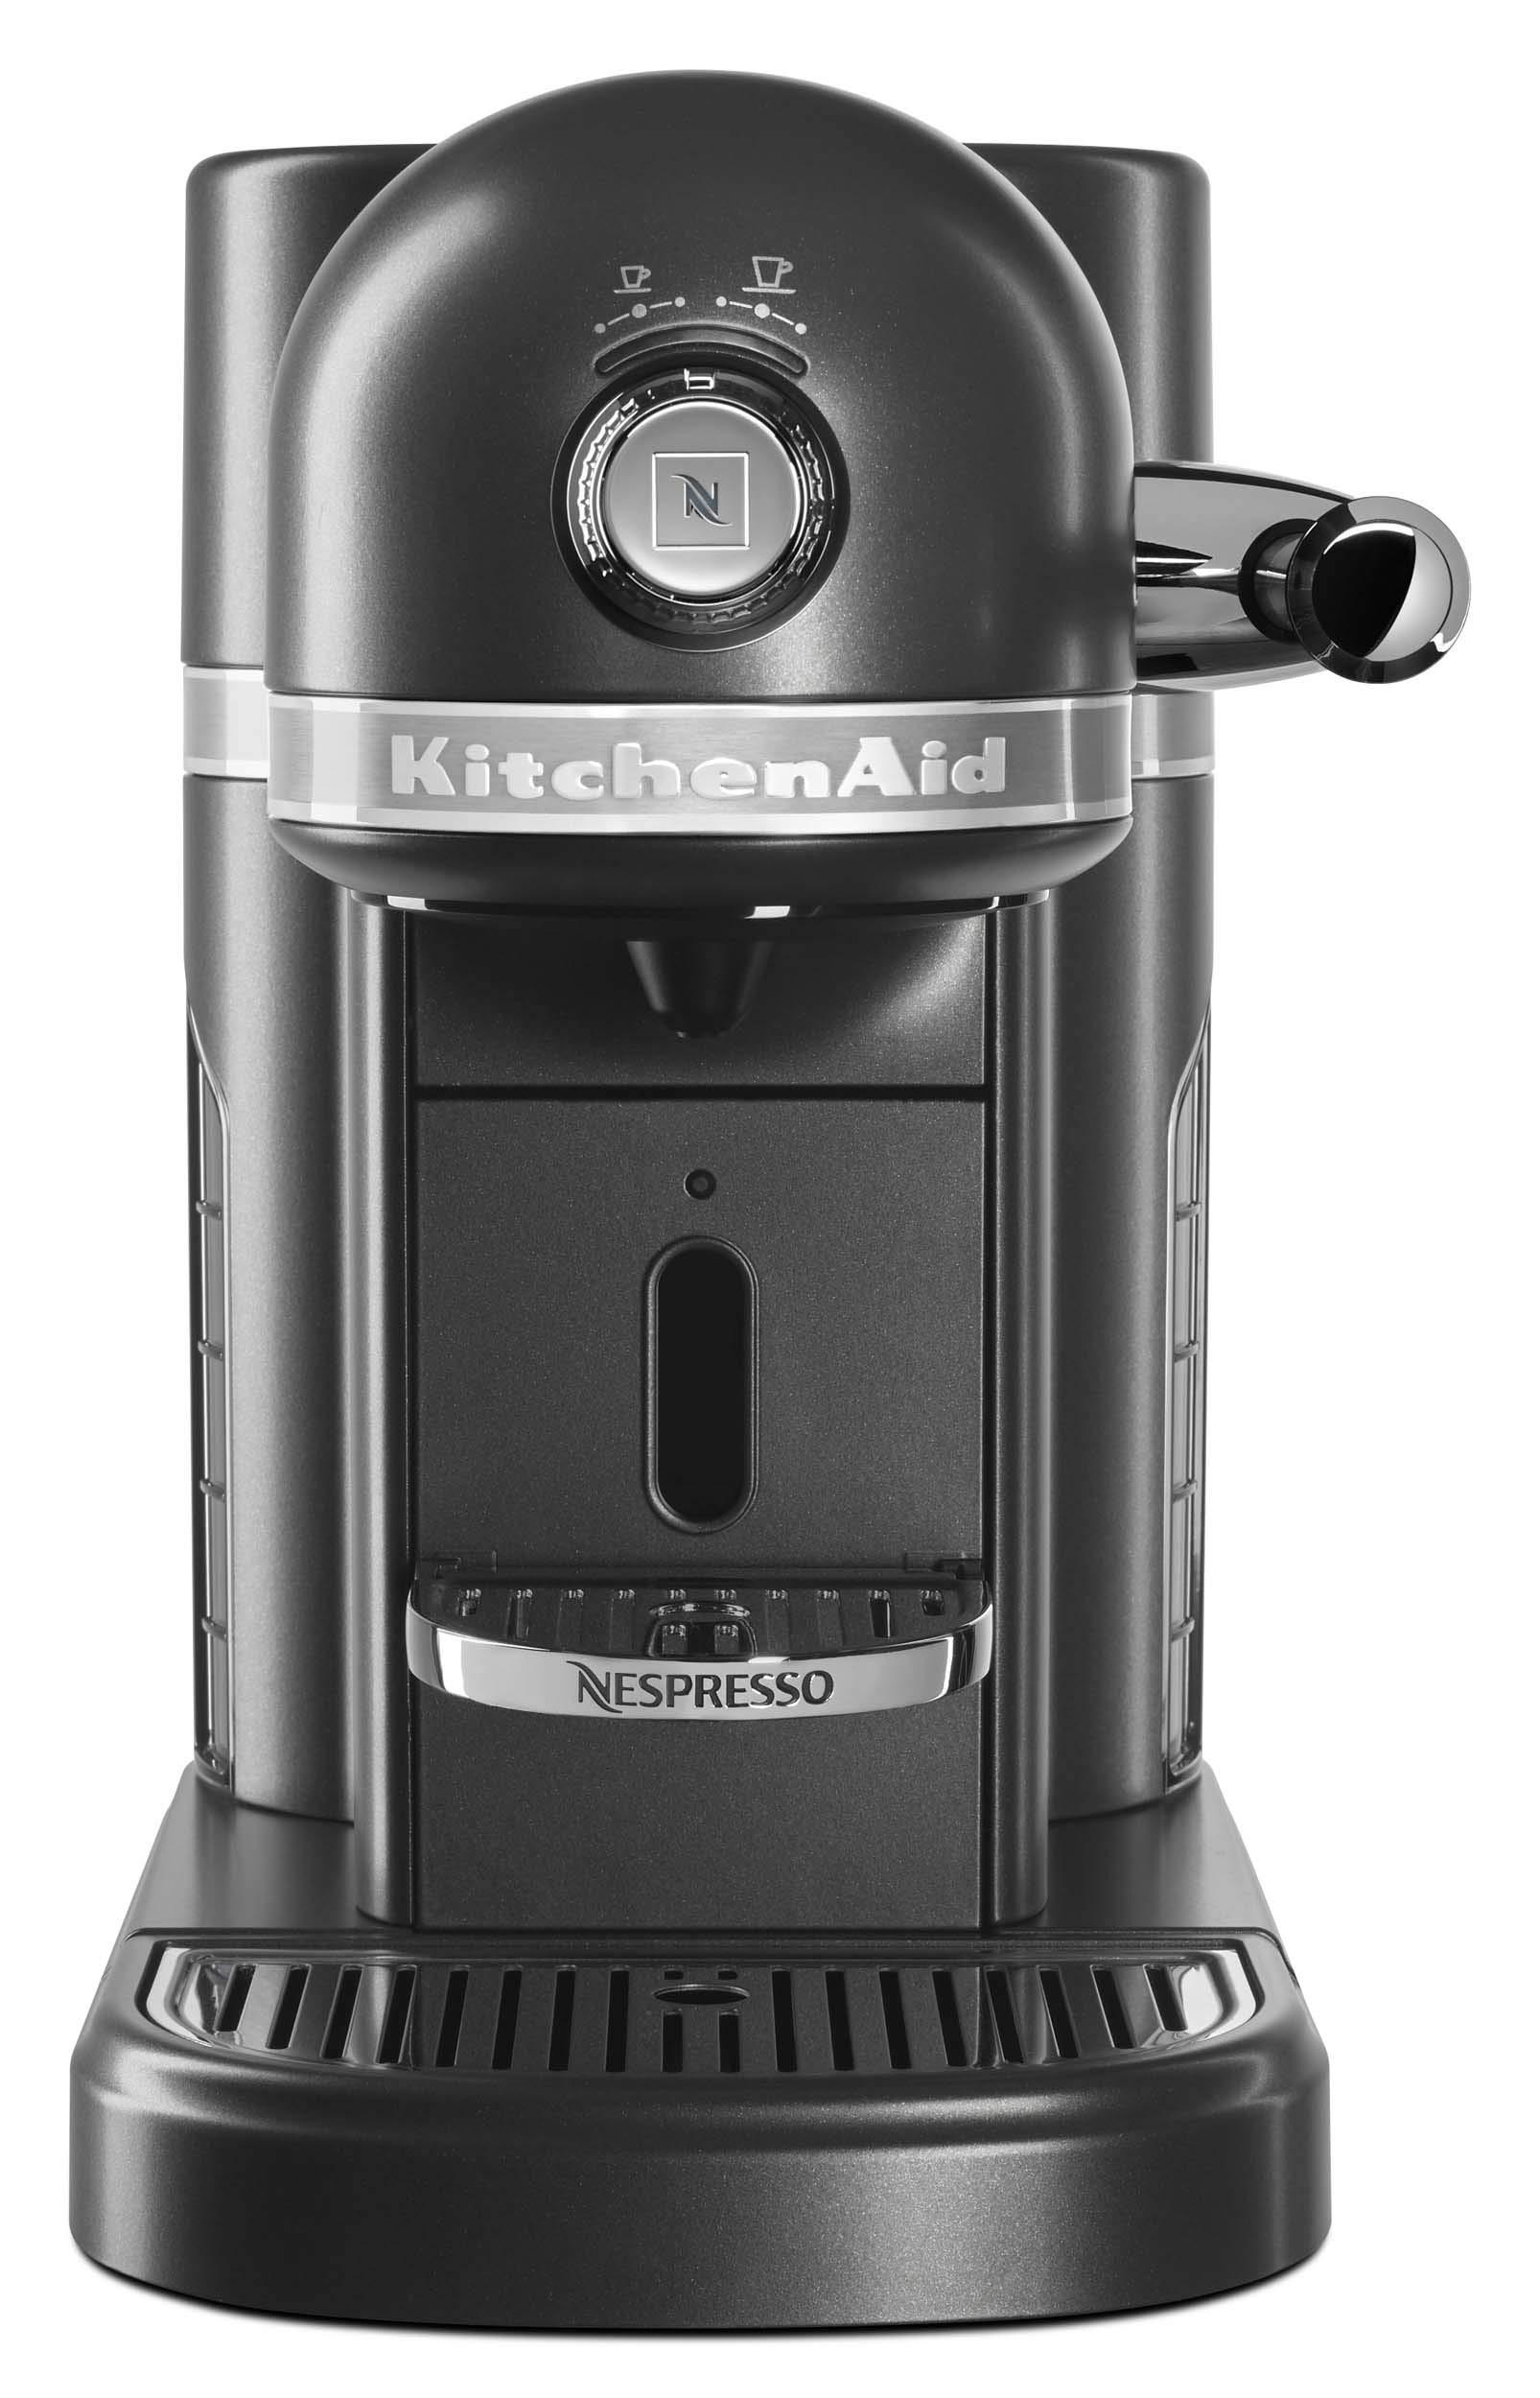 KitchenAid KES0503SZ Nespresso Maker, One Size, Slate by KitchenAid